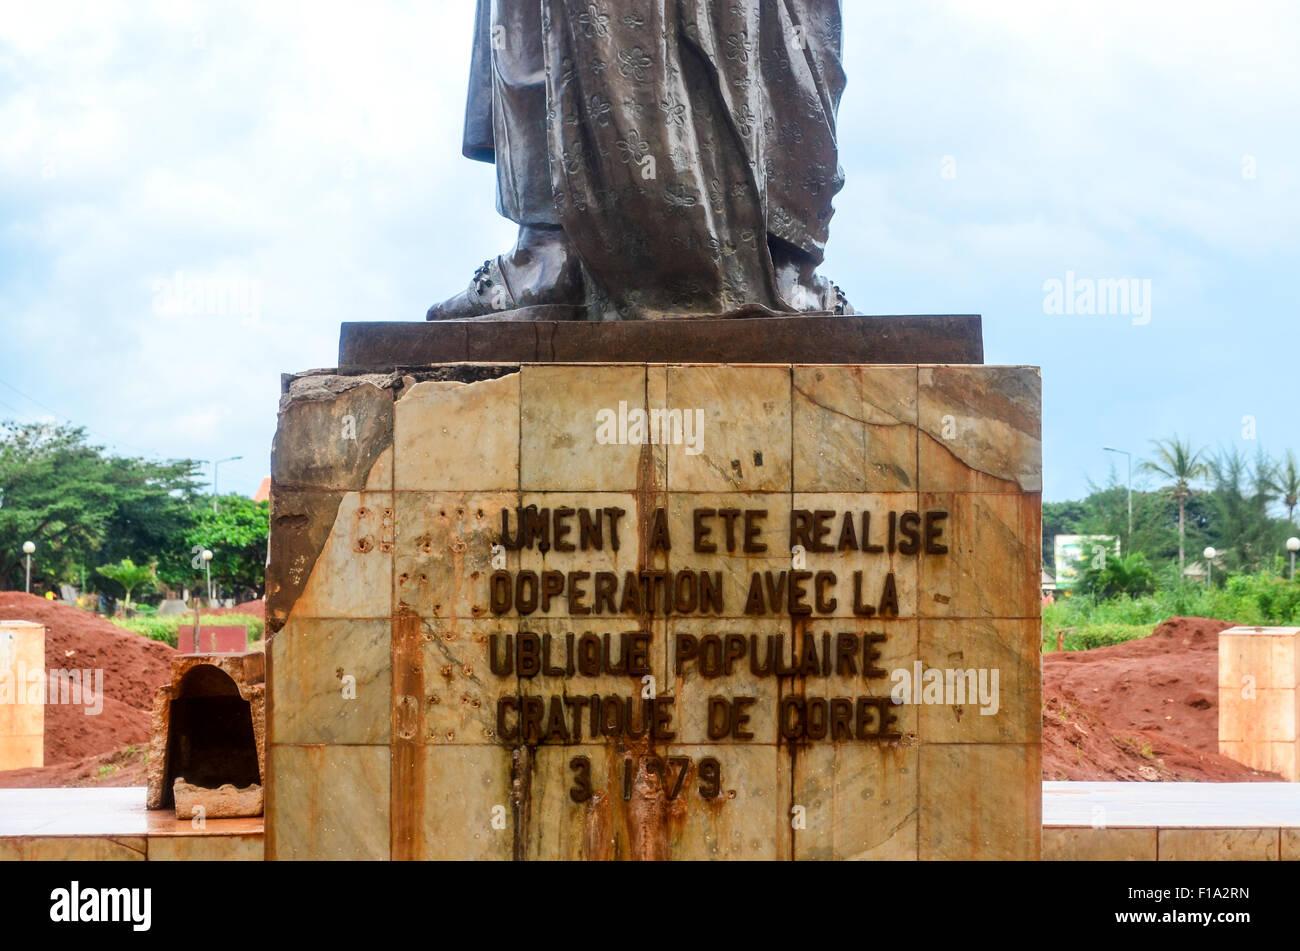 Estatua de Corea del Norte En Abomey, Benin, África Imagen De Stock